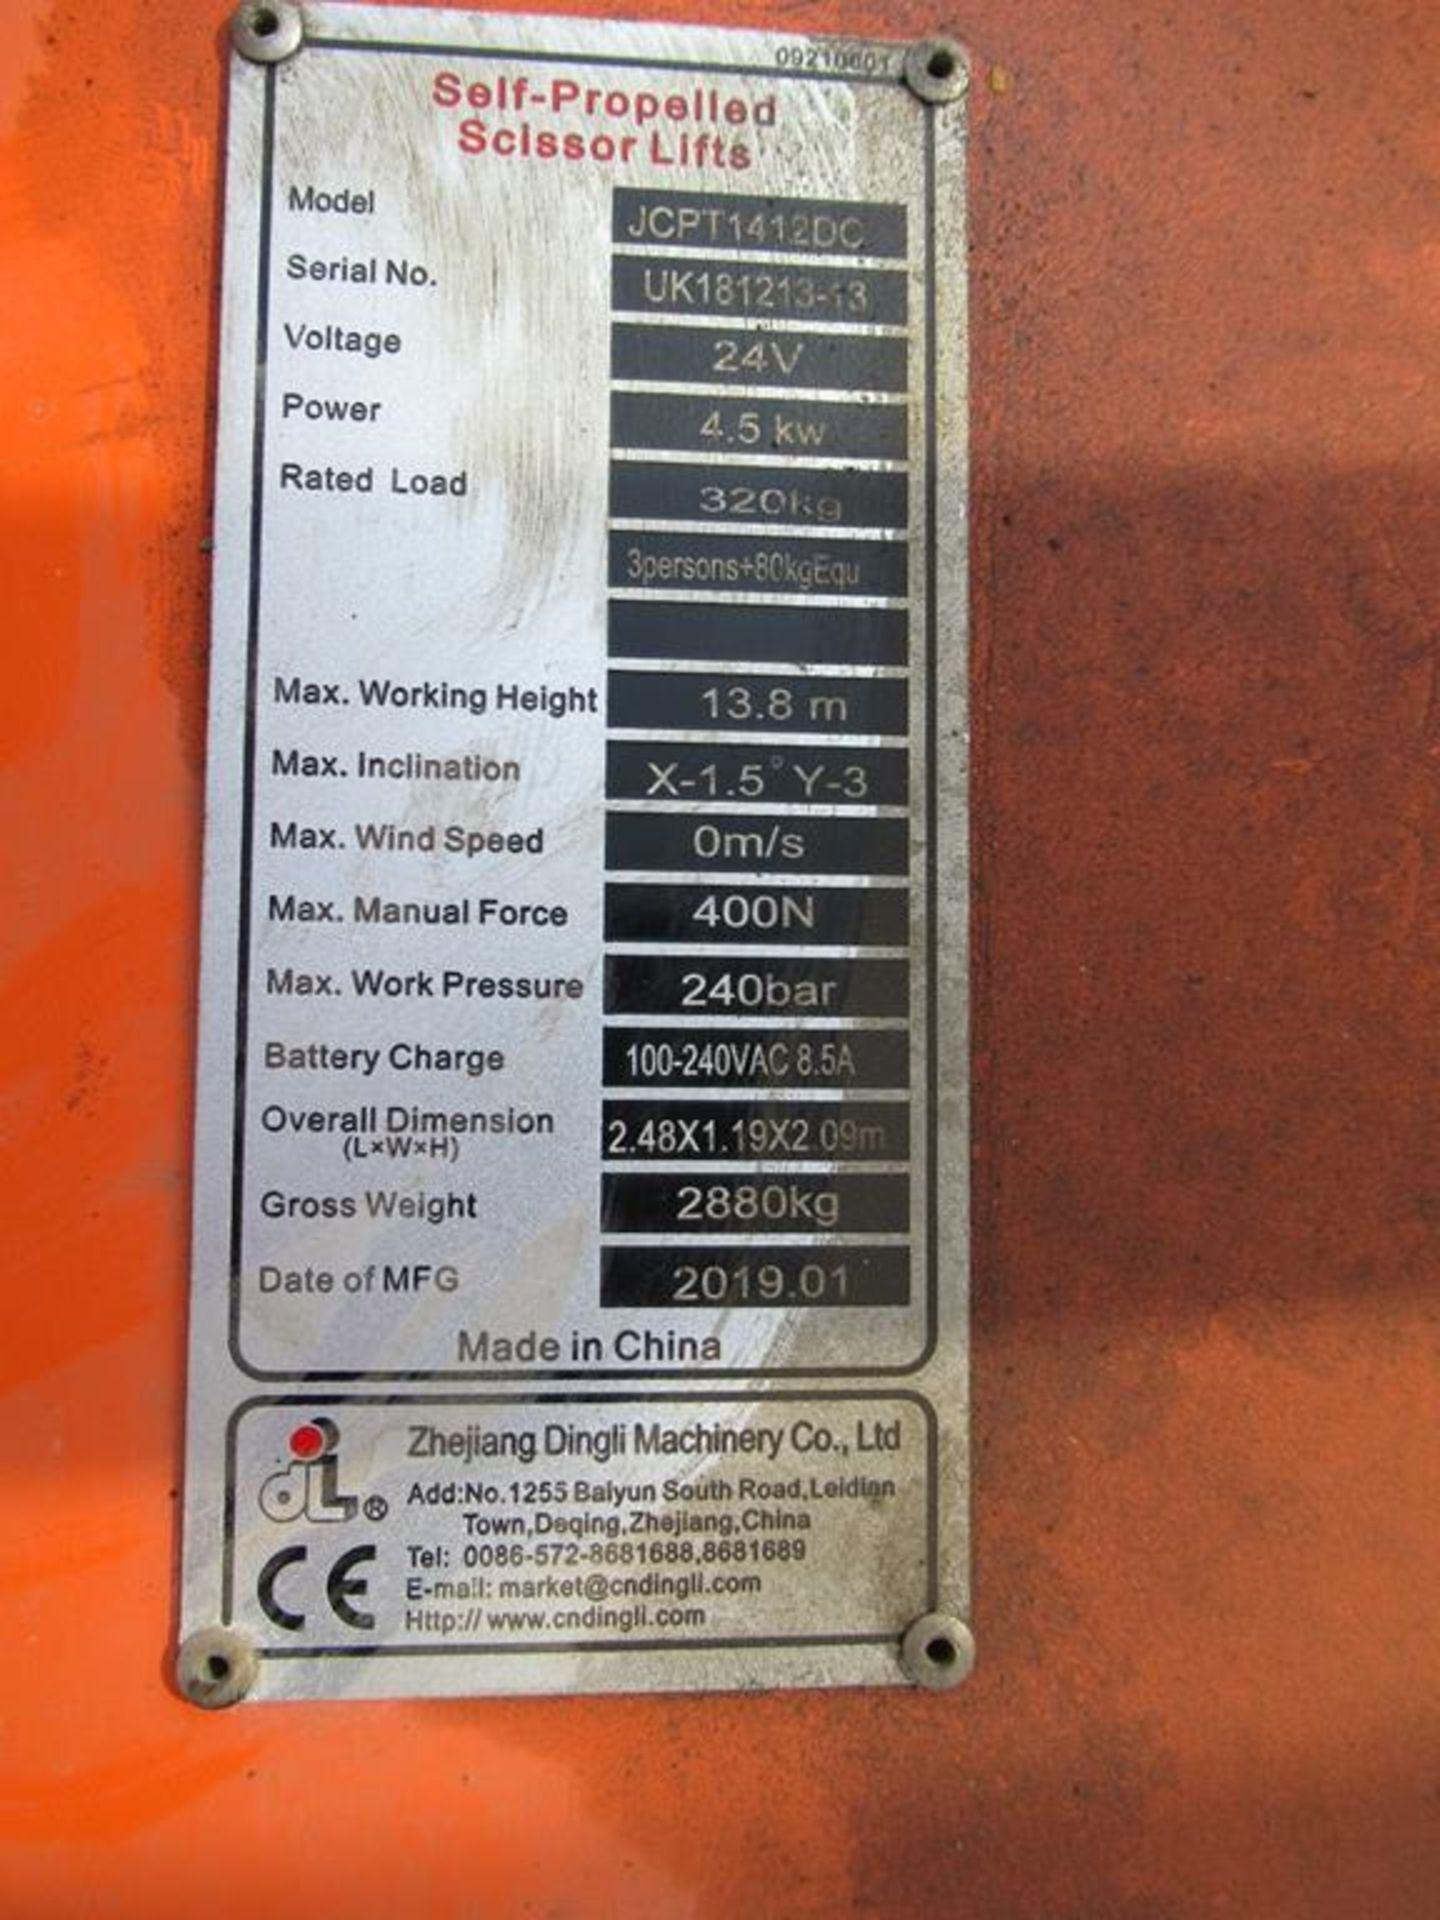 Dingli JCPT 1412 DC 24V electric scissor lift - Image 2 of 7